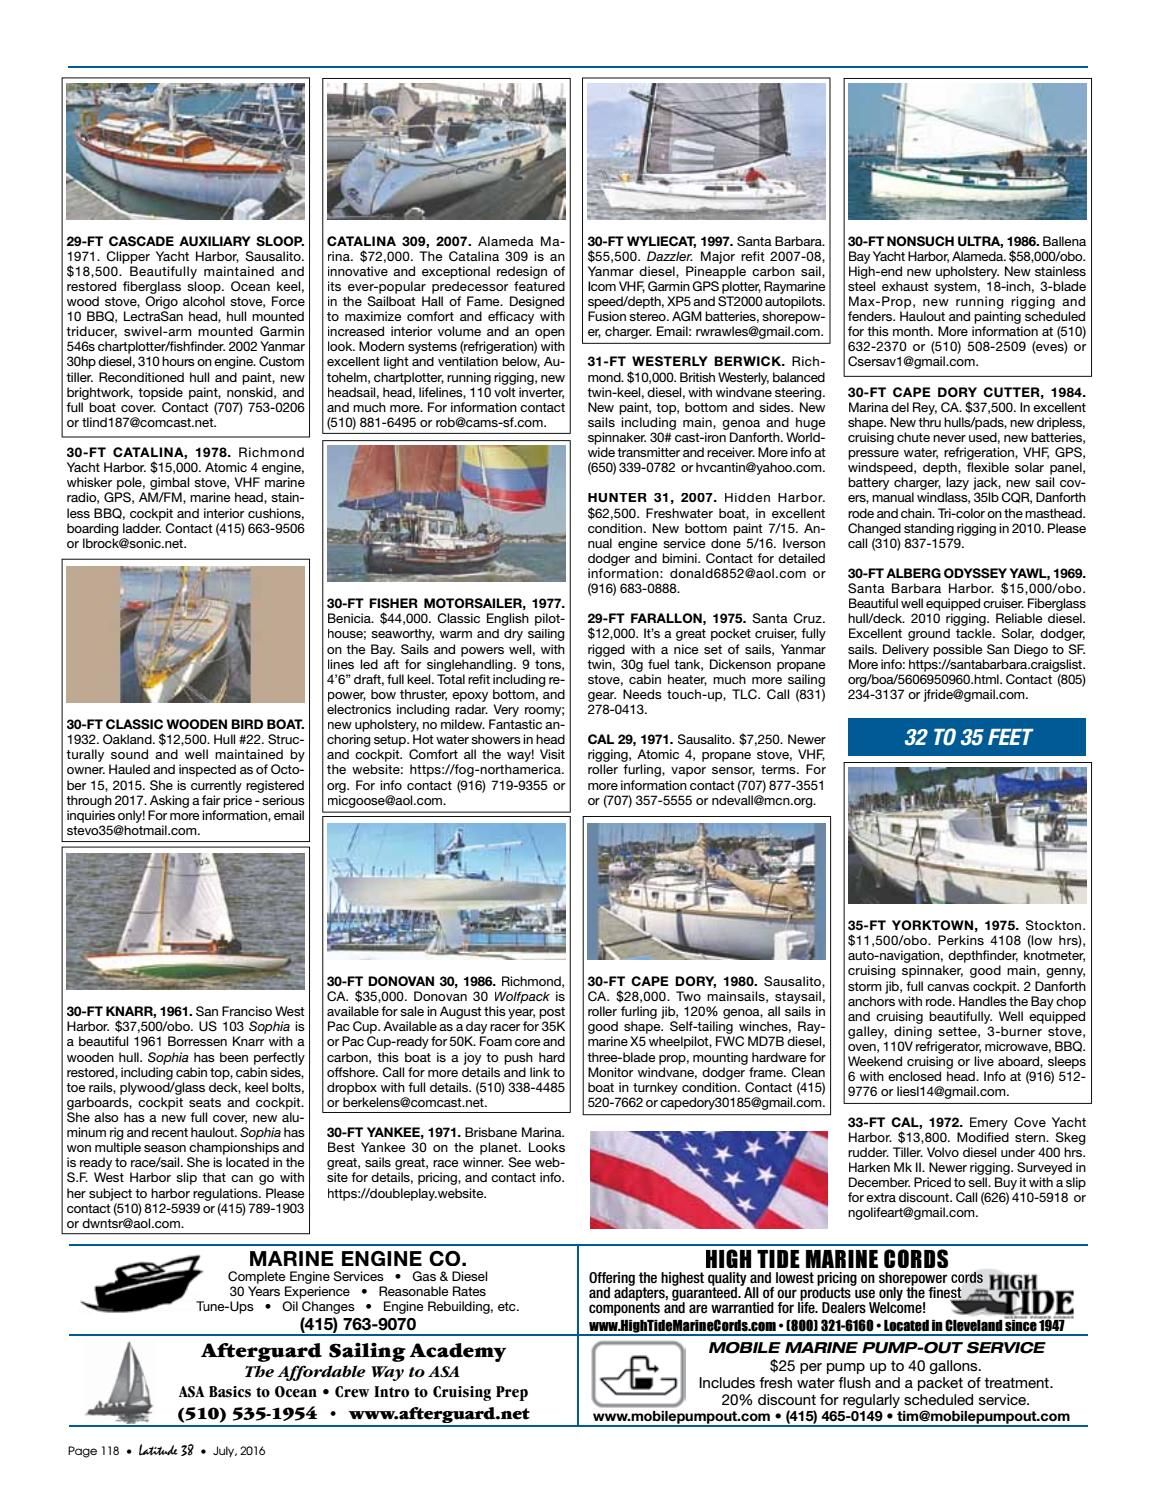 Latitude 38 July 2016 by Latitude 38 Media, LLC - issuu